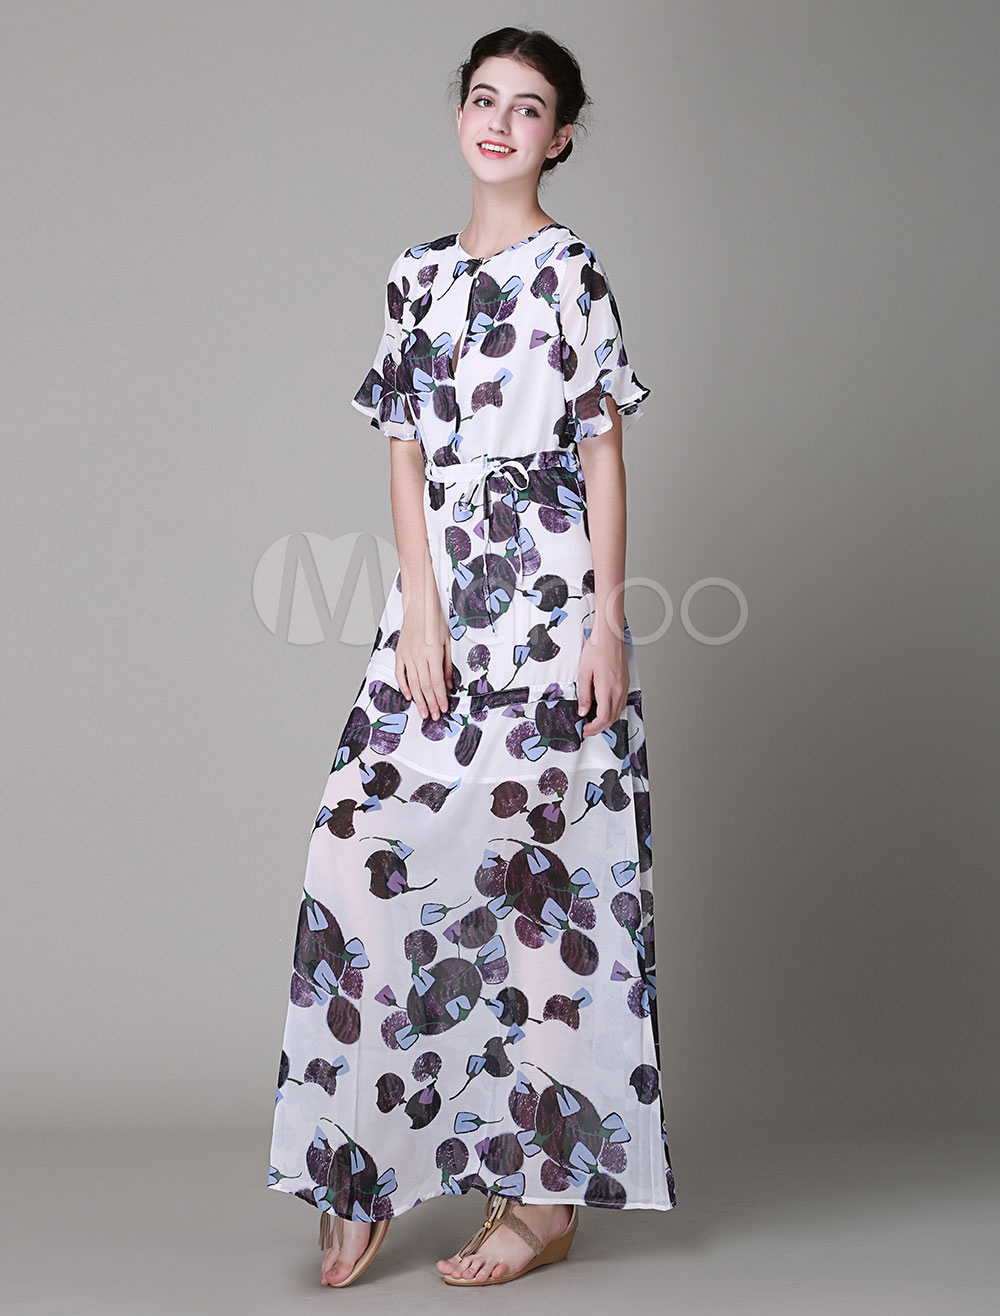 Scoop Neck Falbala High-waisted Half Sleeves Floral Maxi Dress